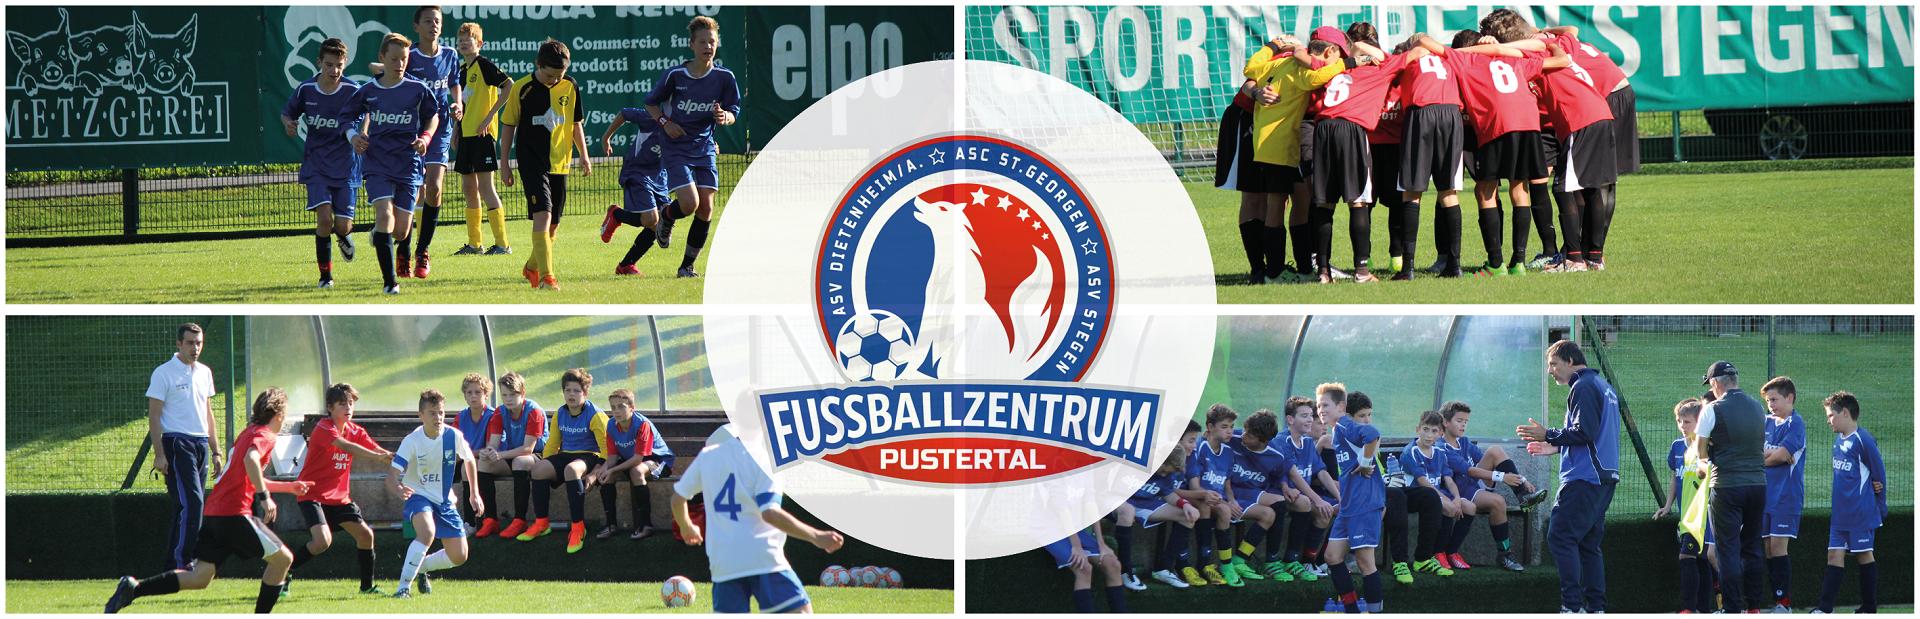 fussballzentrum-pustertal-prova-ita